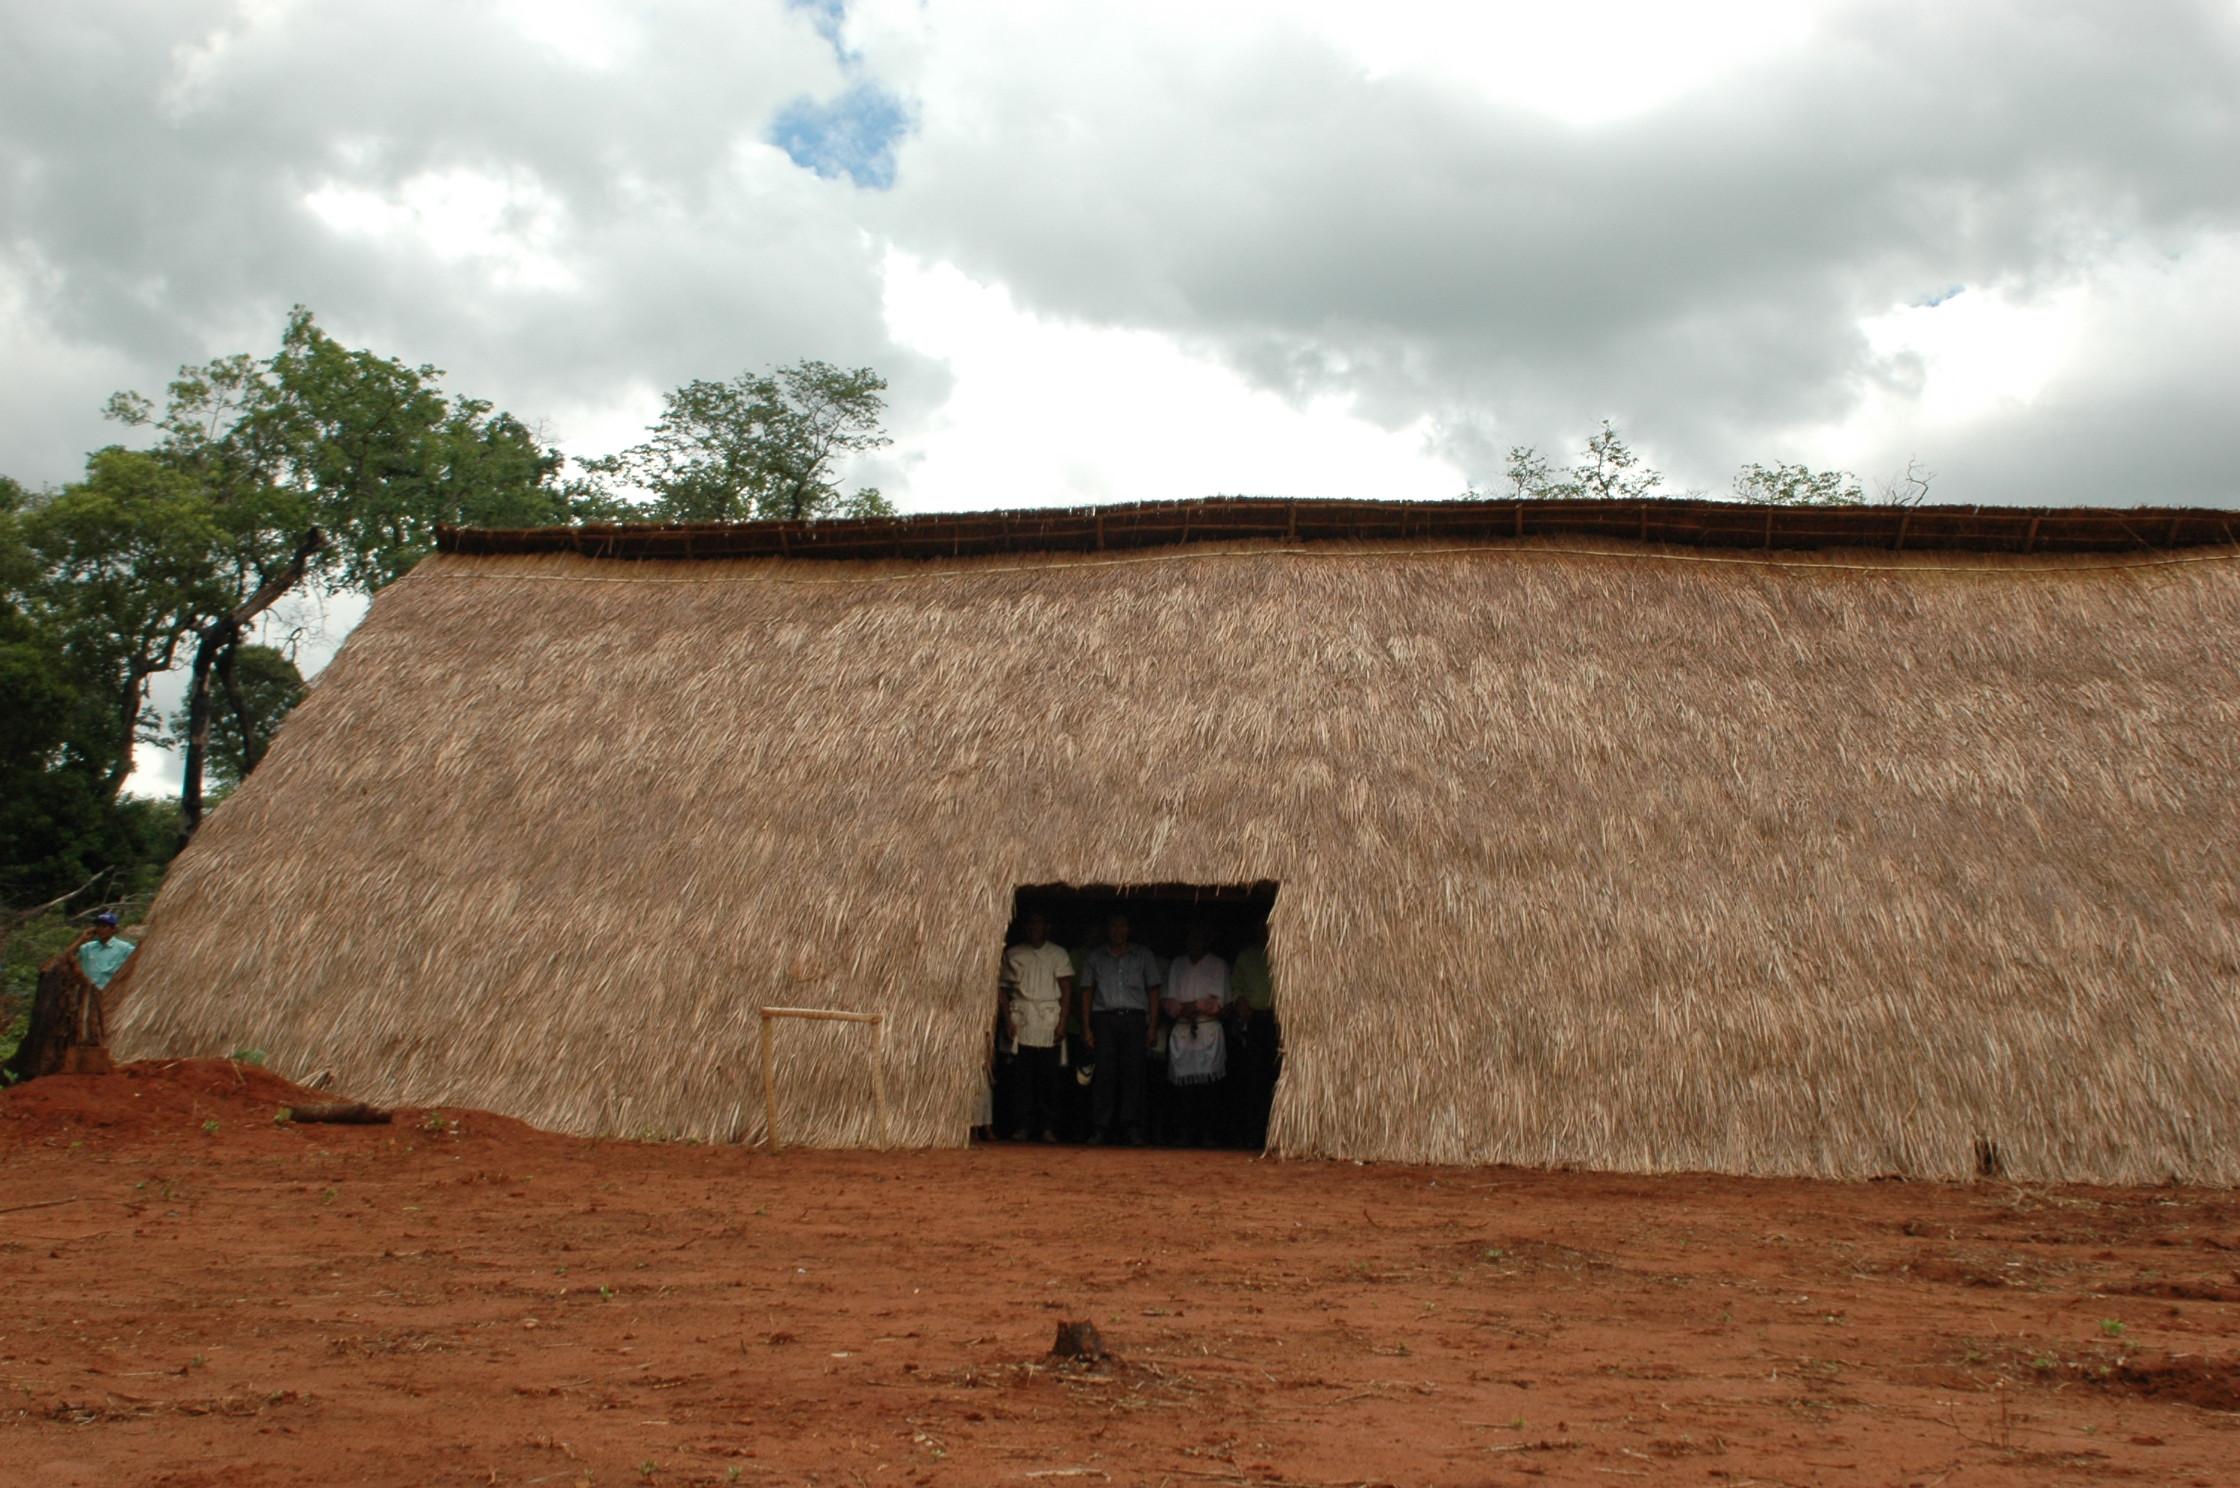 Óga jekutu. Casa ceremonial paĩ tavyterã, guarani. Fotografía: Rocío Ortega. Jaguati, Departamento de Amambay. 2011.